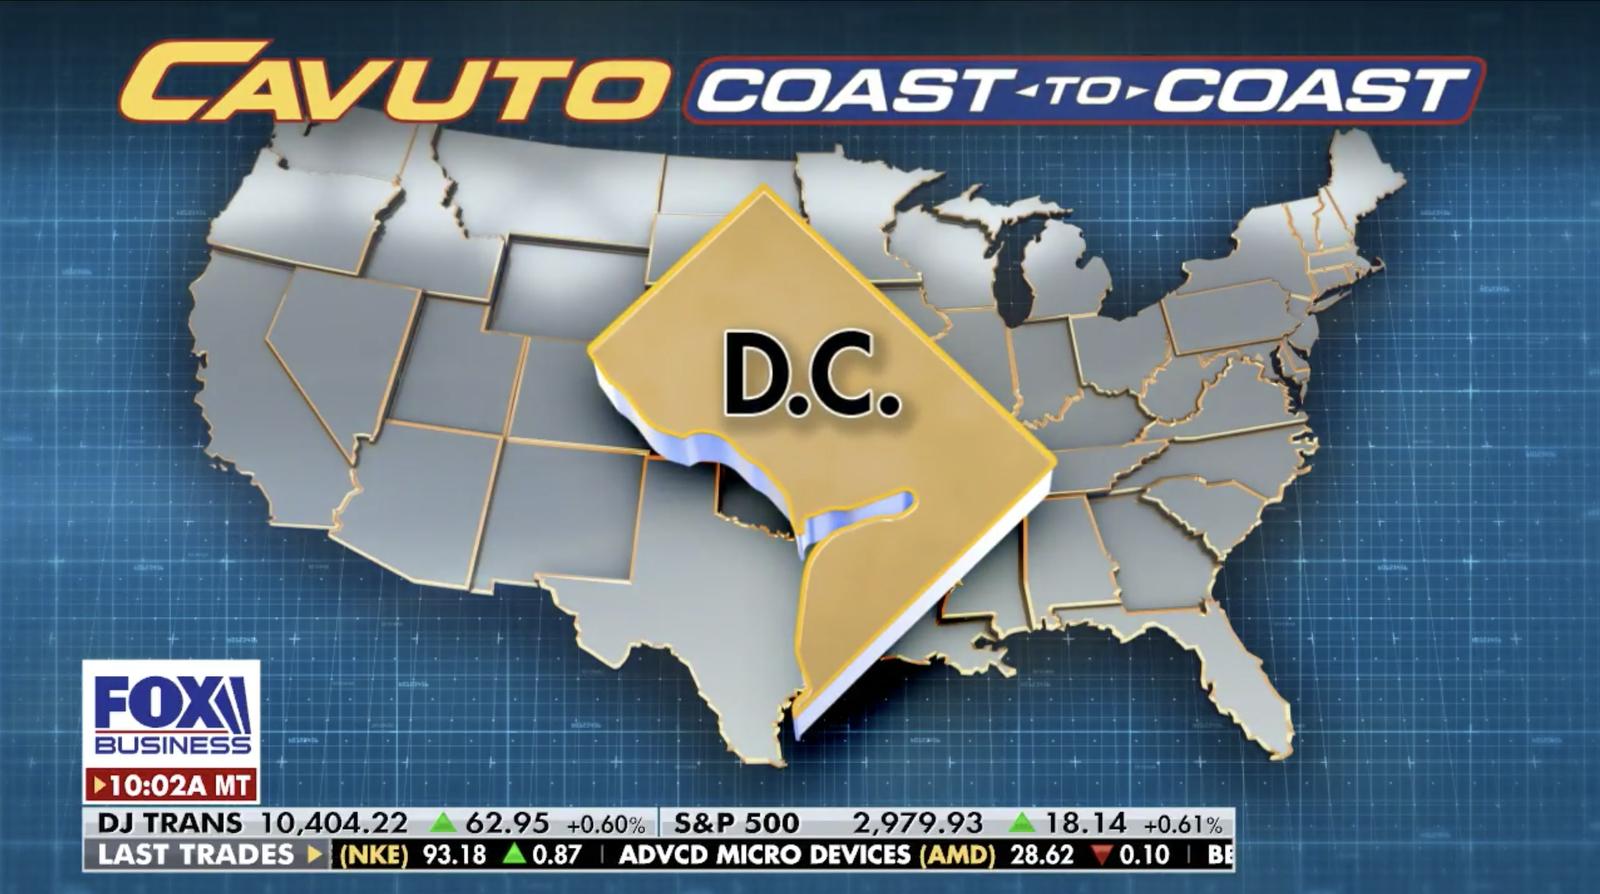 NCS_Fox-Business_Cavuto-Coast-to-Coast_Motion-Graphics_010